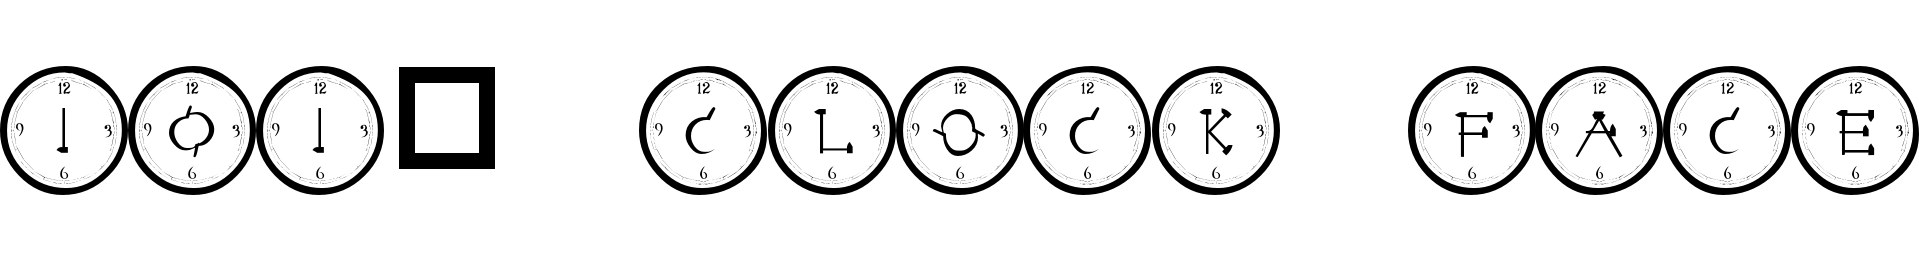 101! Clock Face